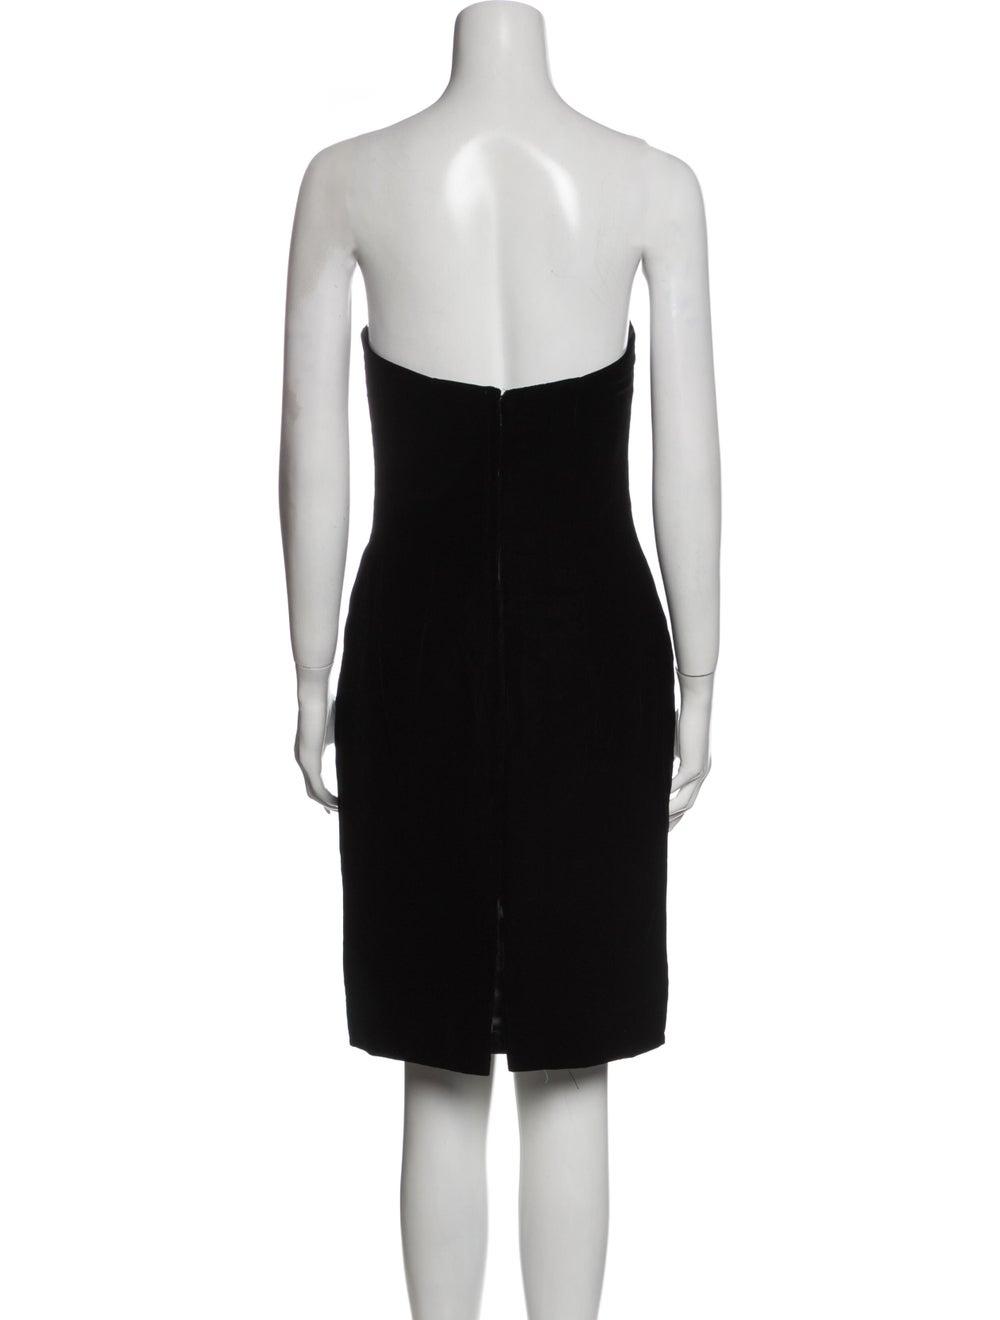 Victor Costa Strapless Mini Dress Black - image 3